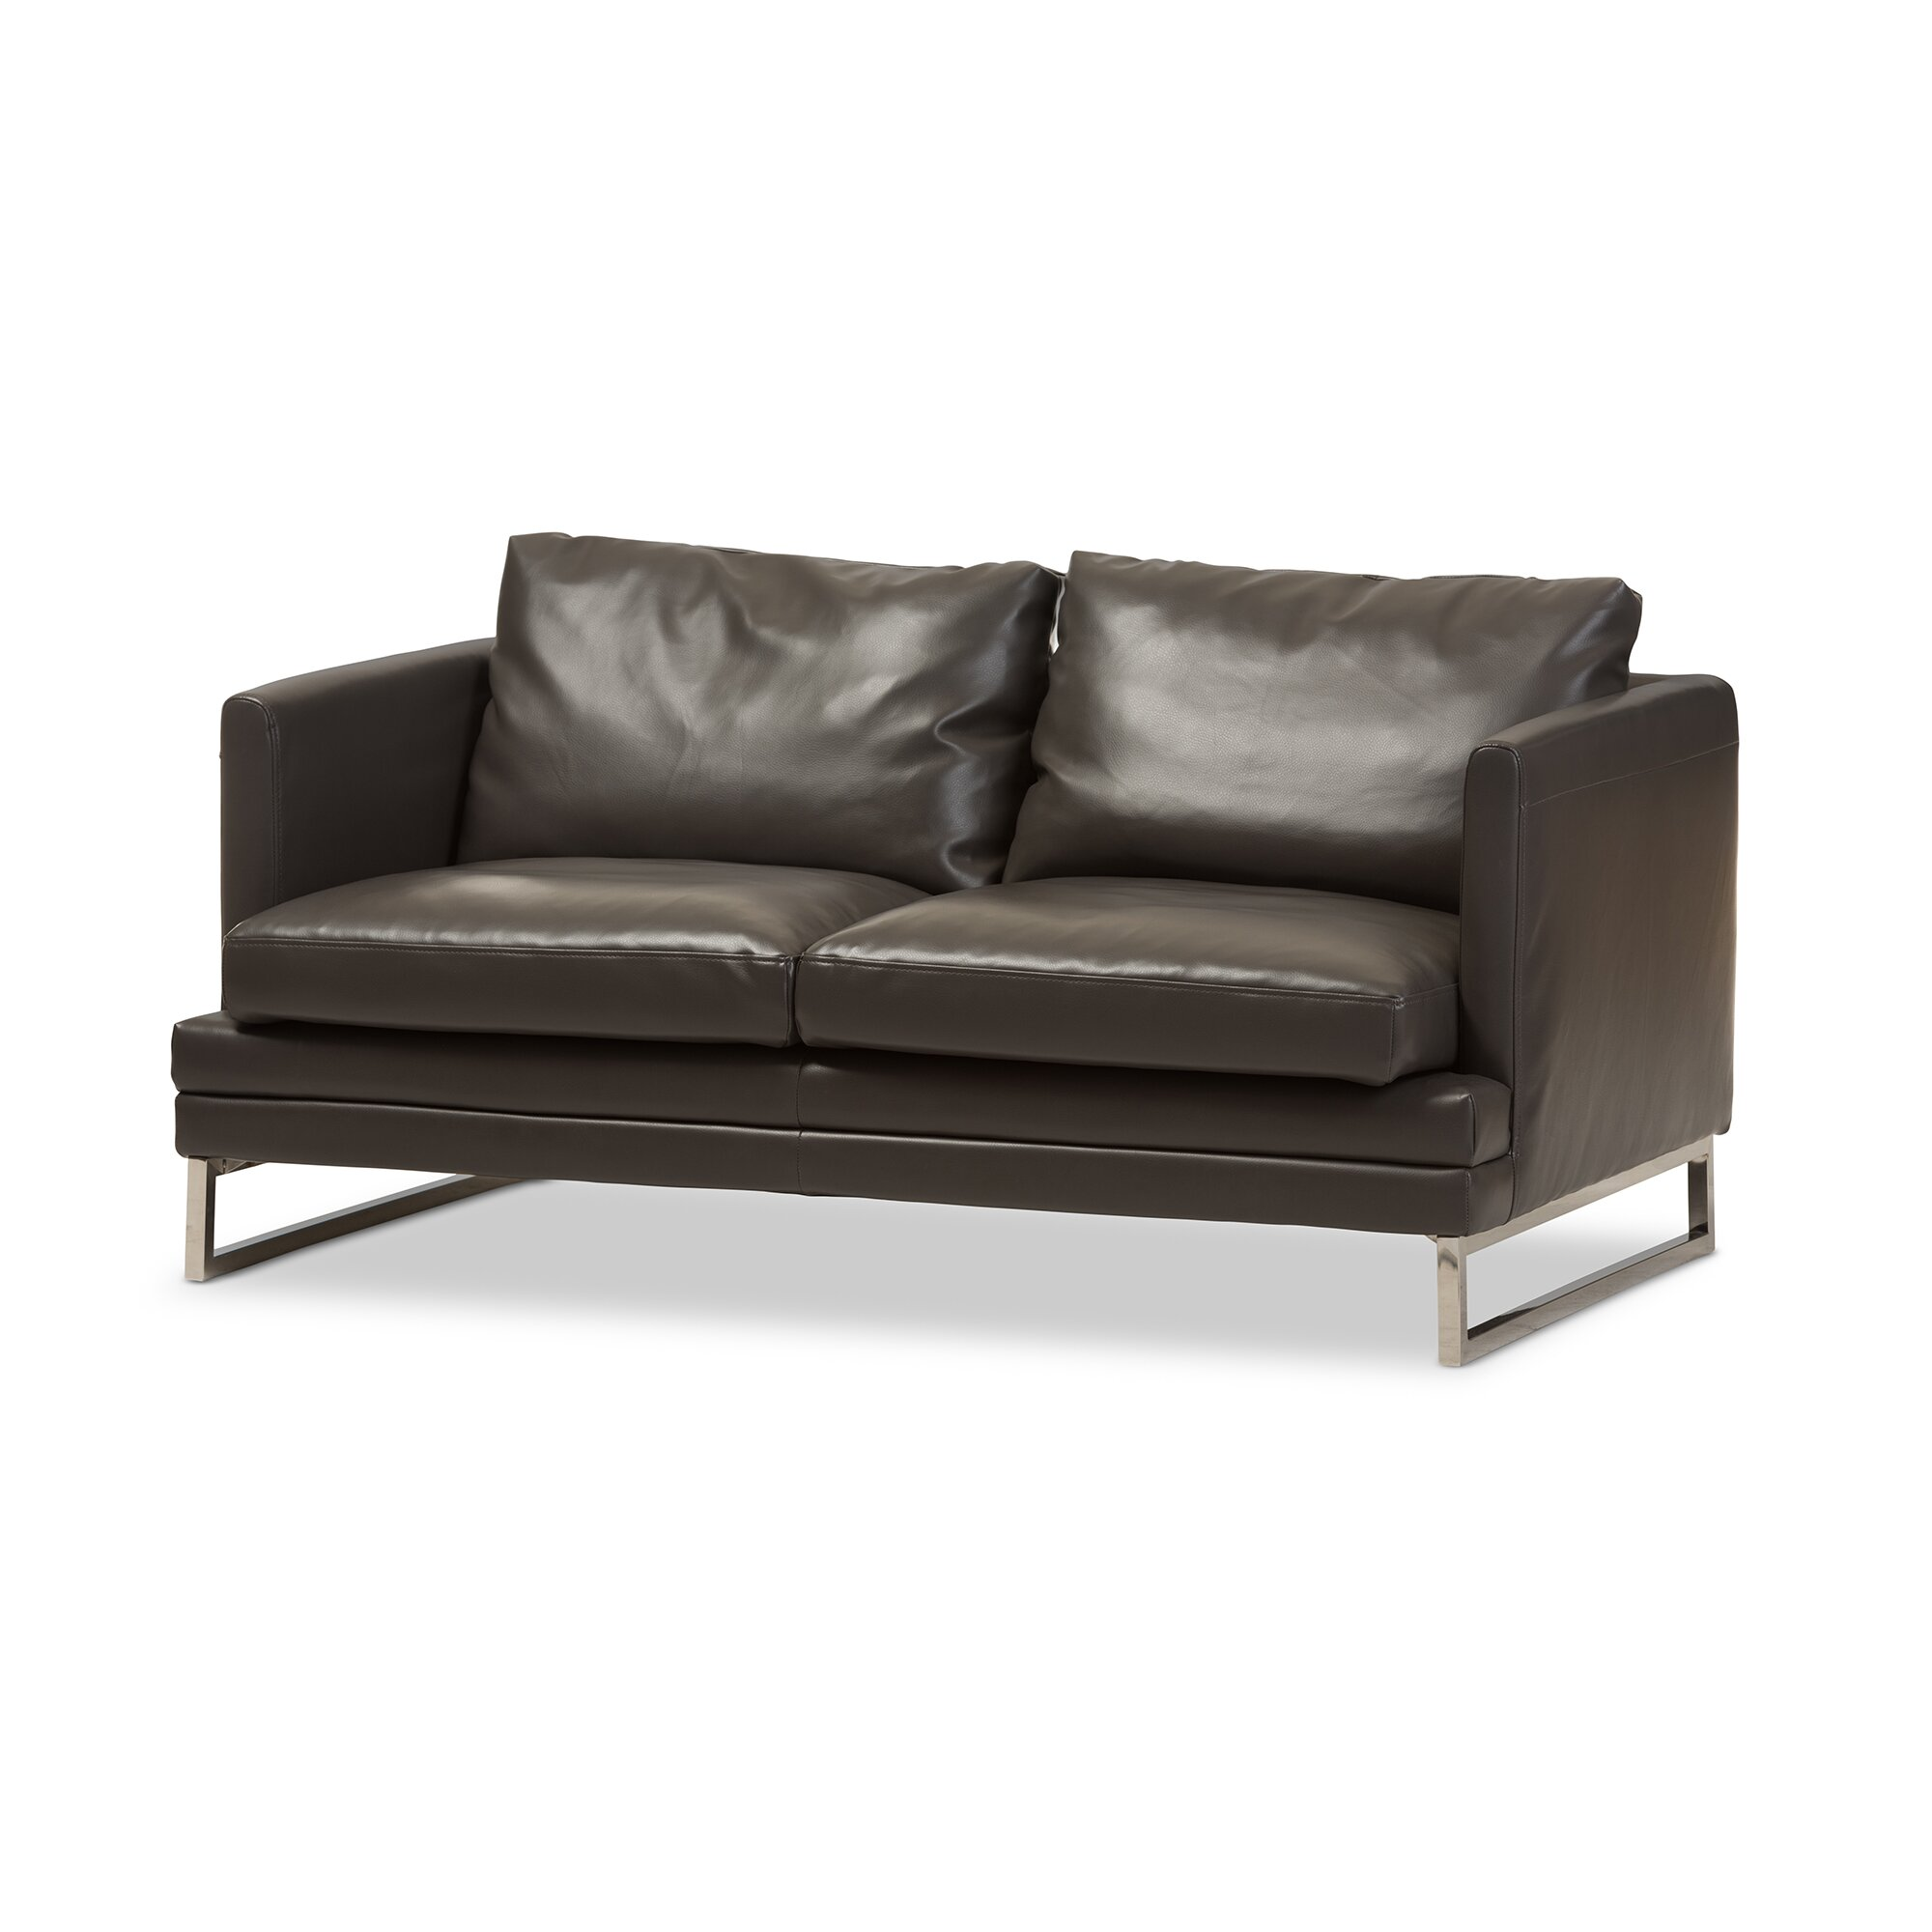 Wholesale Interiors Baxton Studio Dakota Leather Loveseat Reviews Wayfair